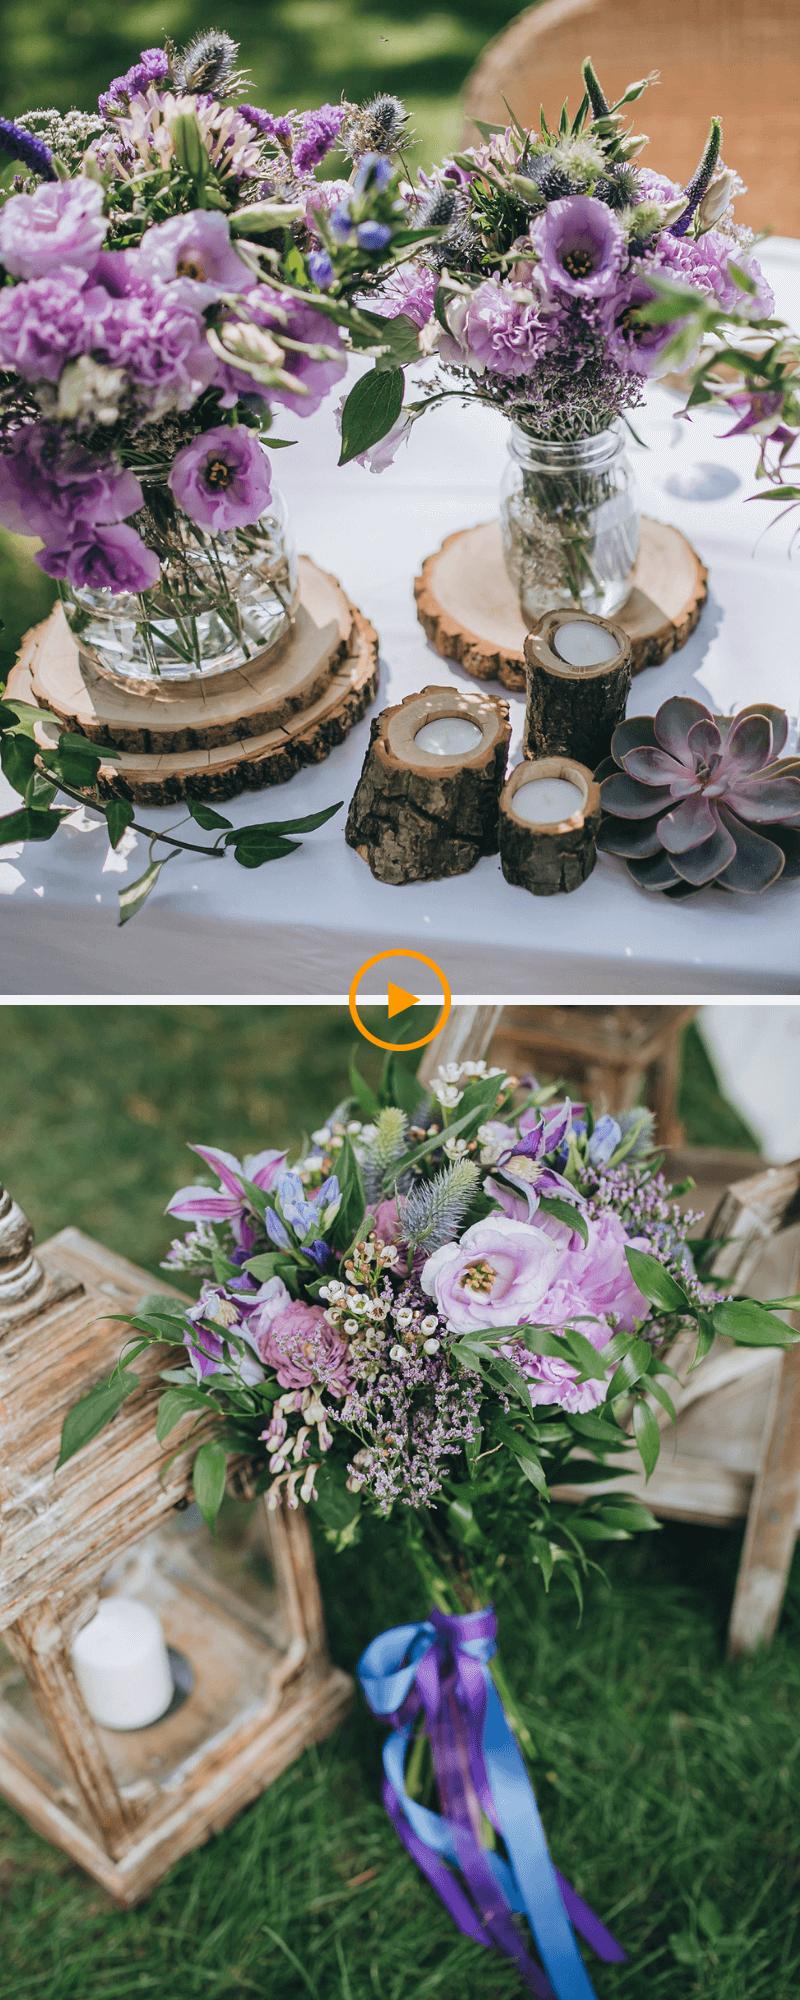 Ideas Decorativas De Flores Silvestres Para Bodas Rusticas Matrimonio Rustico Centrotavola Nuziale Matrimonio Tavolo Rustico